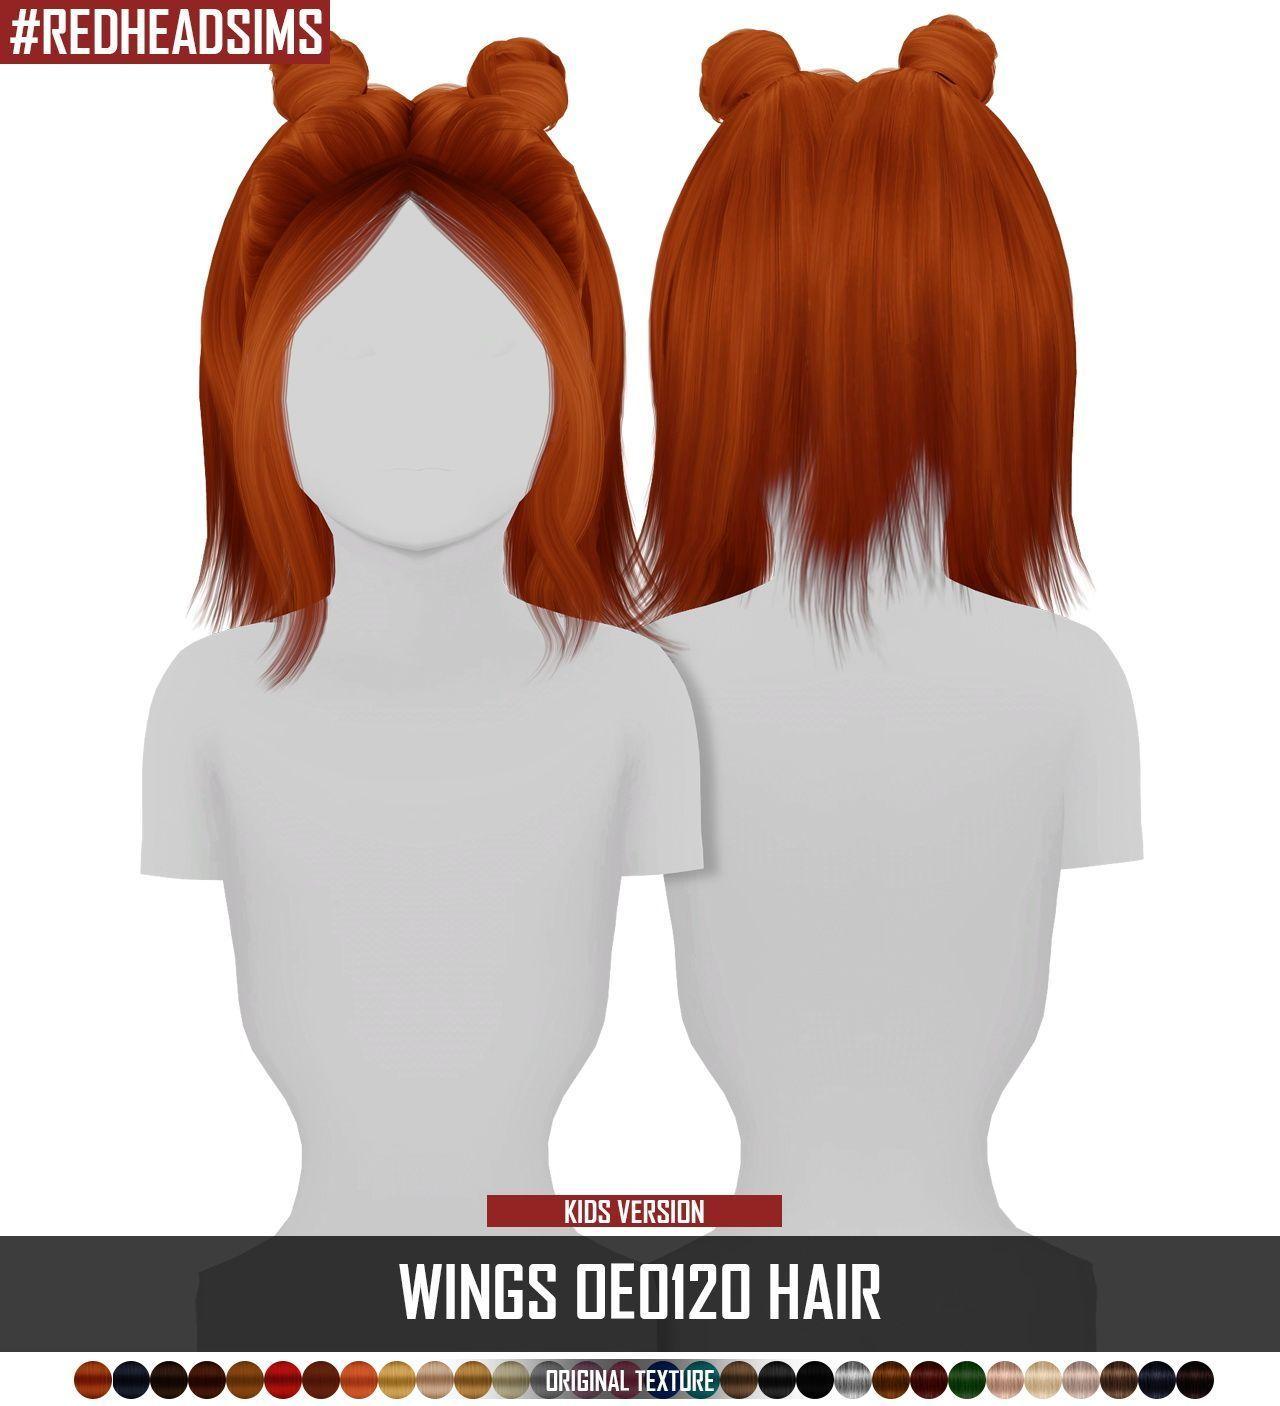 Sims 4 Hairs ~ Coupure Electrique: Wings OE0120 Haare retexturiert - Kids Version #kidhair Coupure Electriques Wings OE0120 Haare retexturiert - Kids Versi ... - #coupure #electrique #haare #hairs #oe0120 #retexturiert #wings - #new